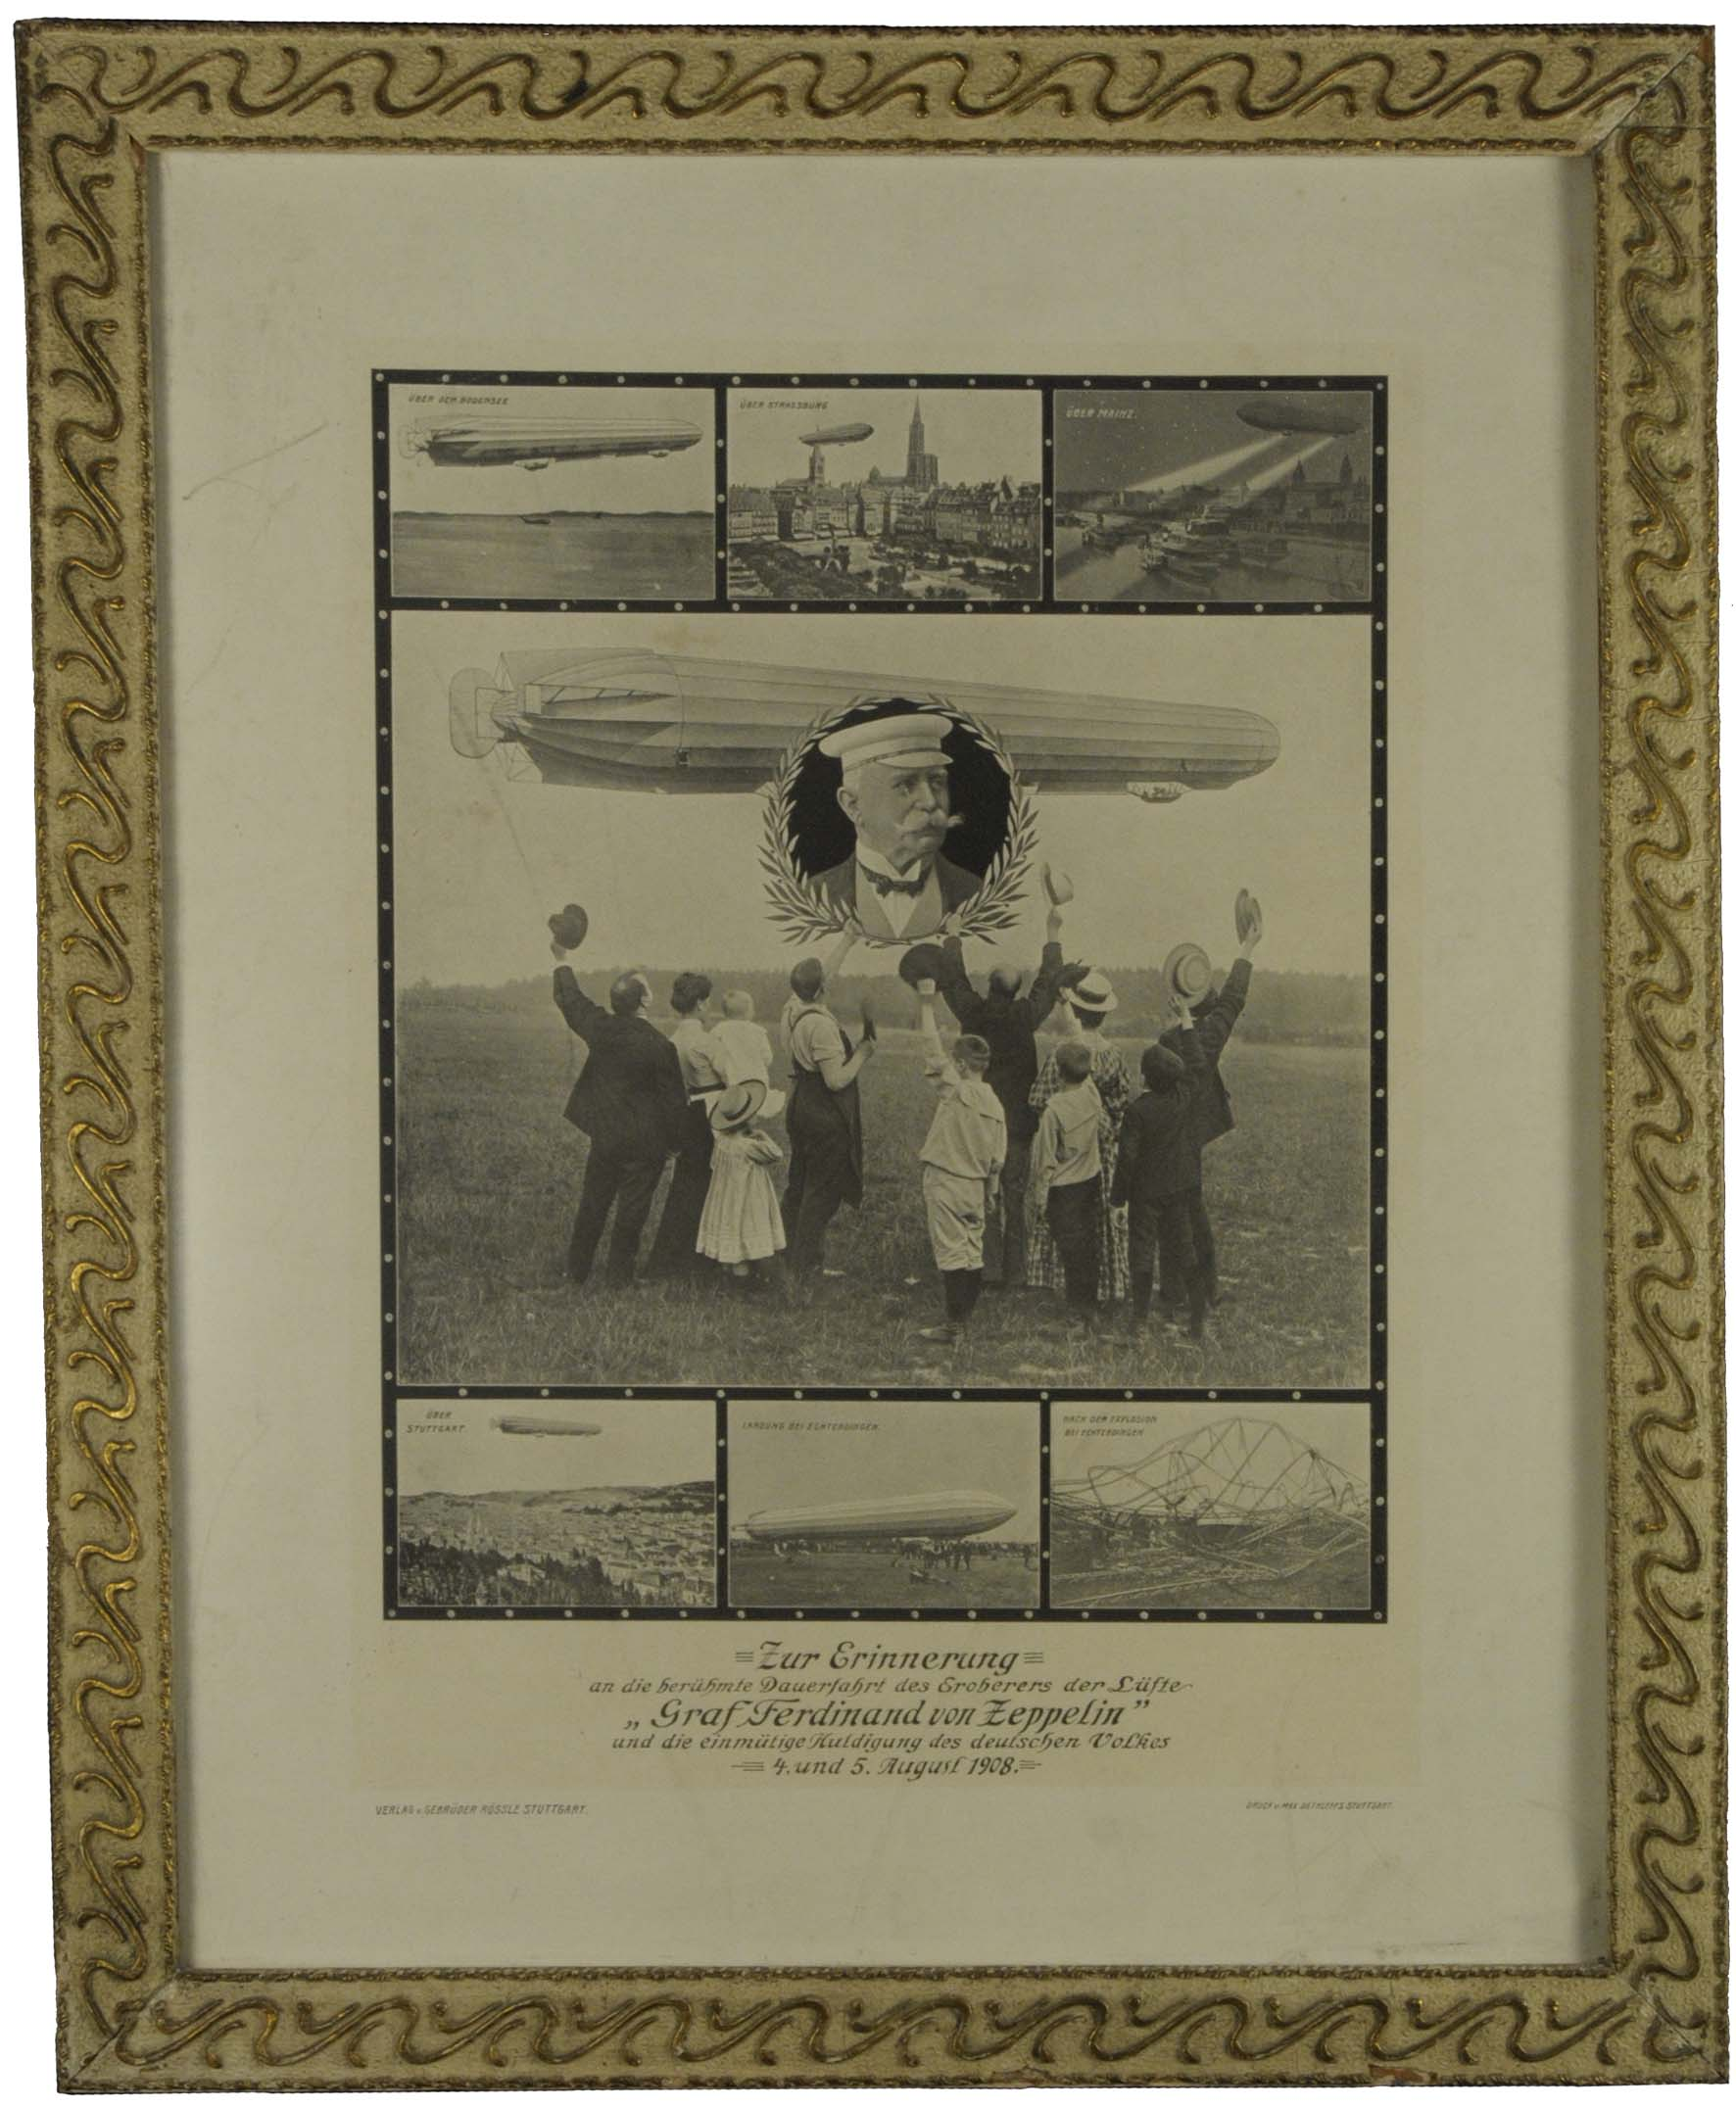 Lot 4095 - Zeppelin-Memorabilien Memorabilien -  Auktionshaus Ulrich Felzmann GmbH & Co. KG